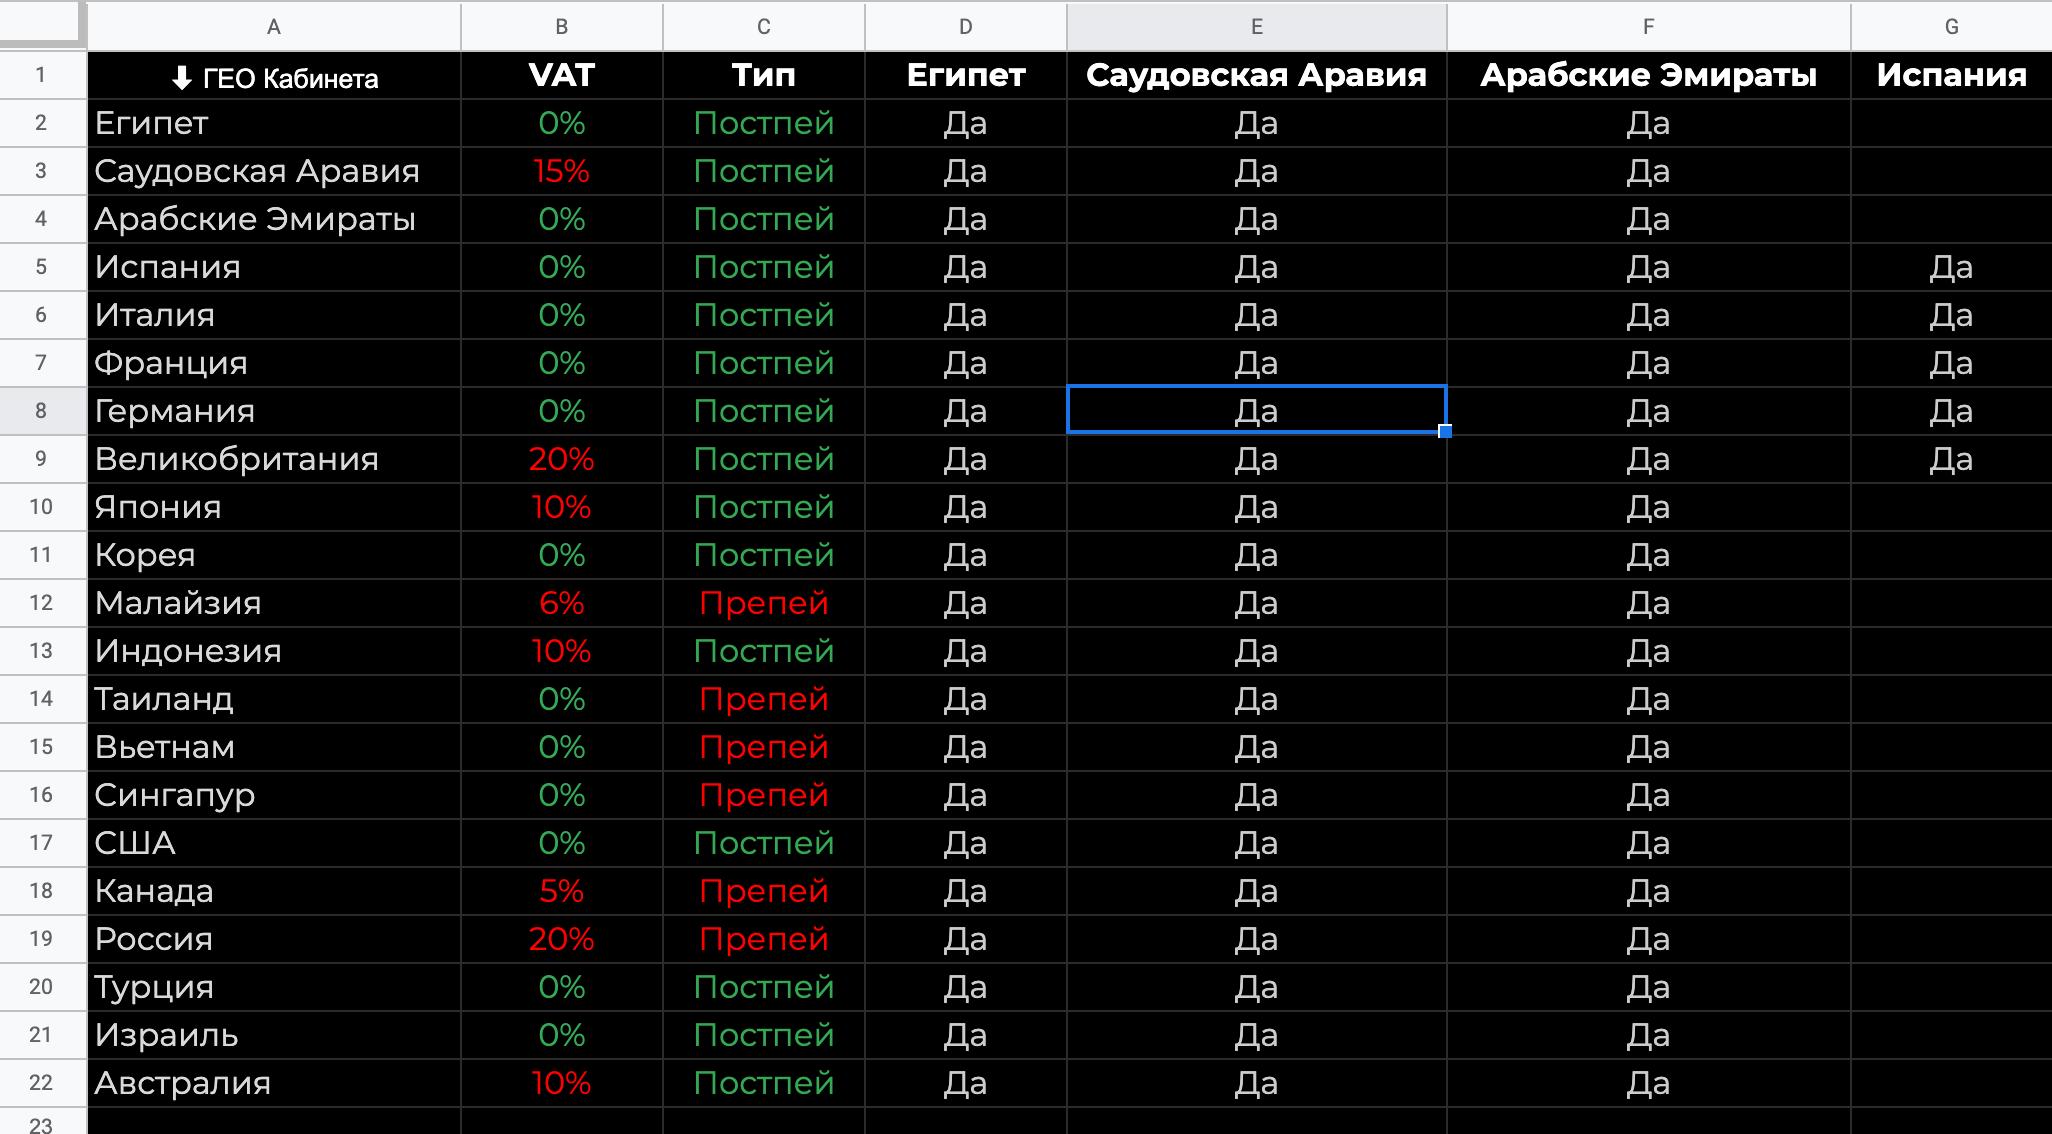 список prepaid & postpay аккаунтотв тикток